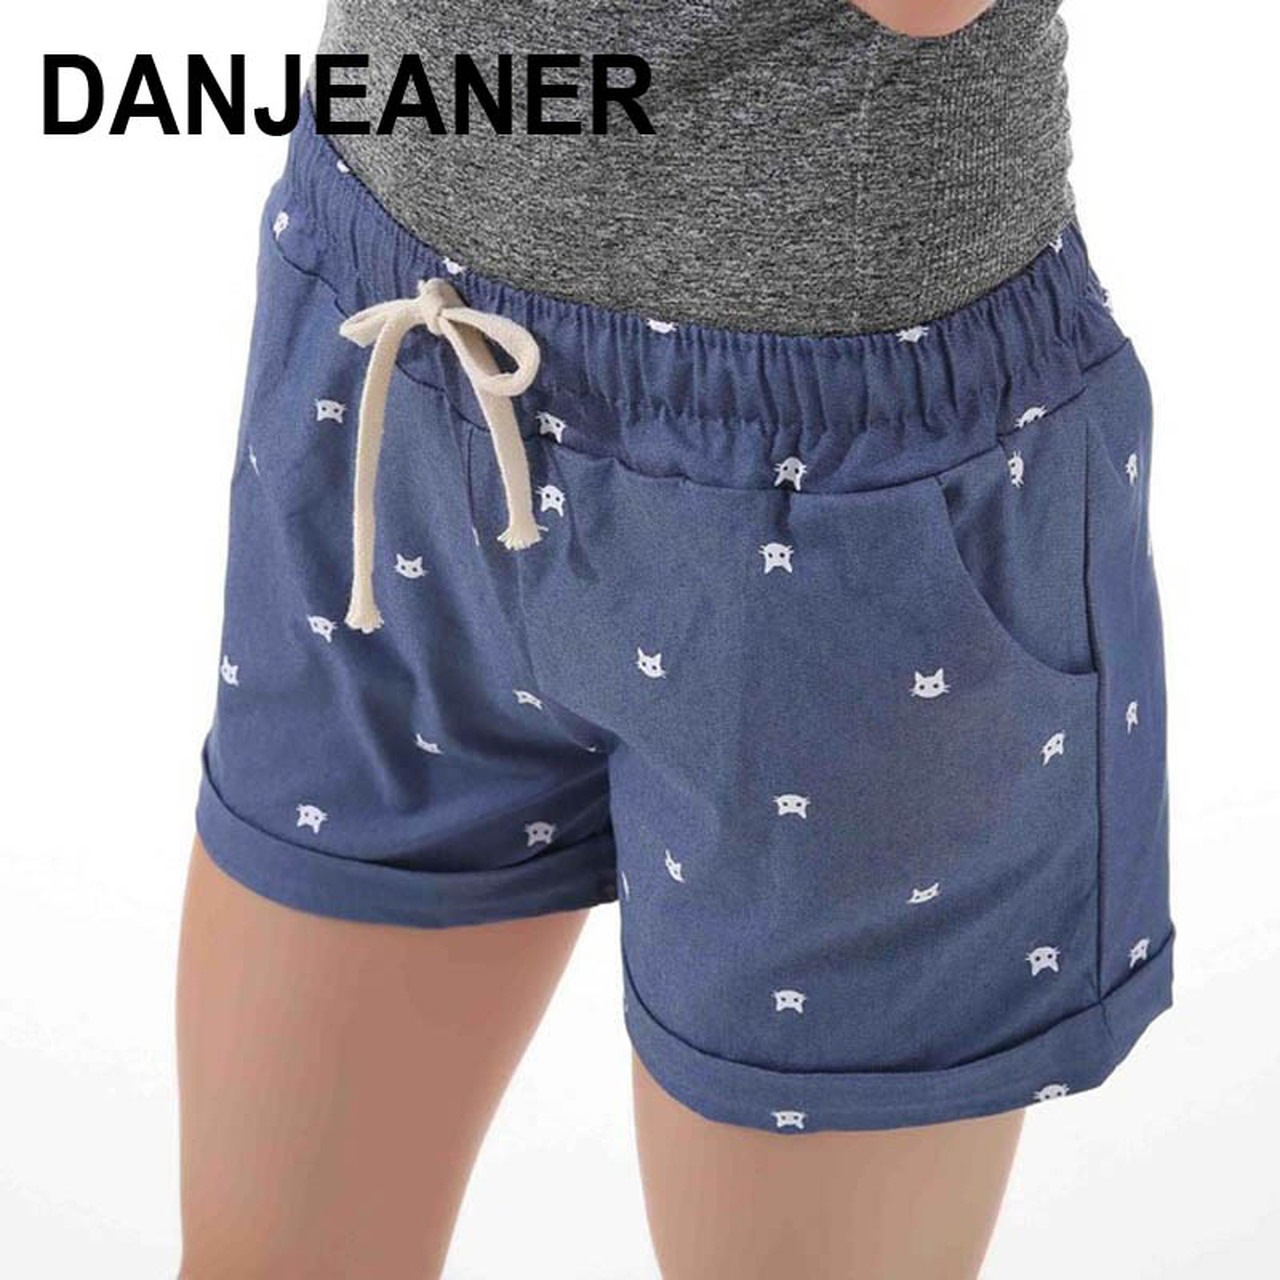 2017 Brand New Summer Women Casual Elastic Waist Cotton Shorts Printed Cat Drawstring Slim Shorts Candy Colors Women Shorts Onshopdeals Com